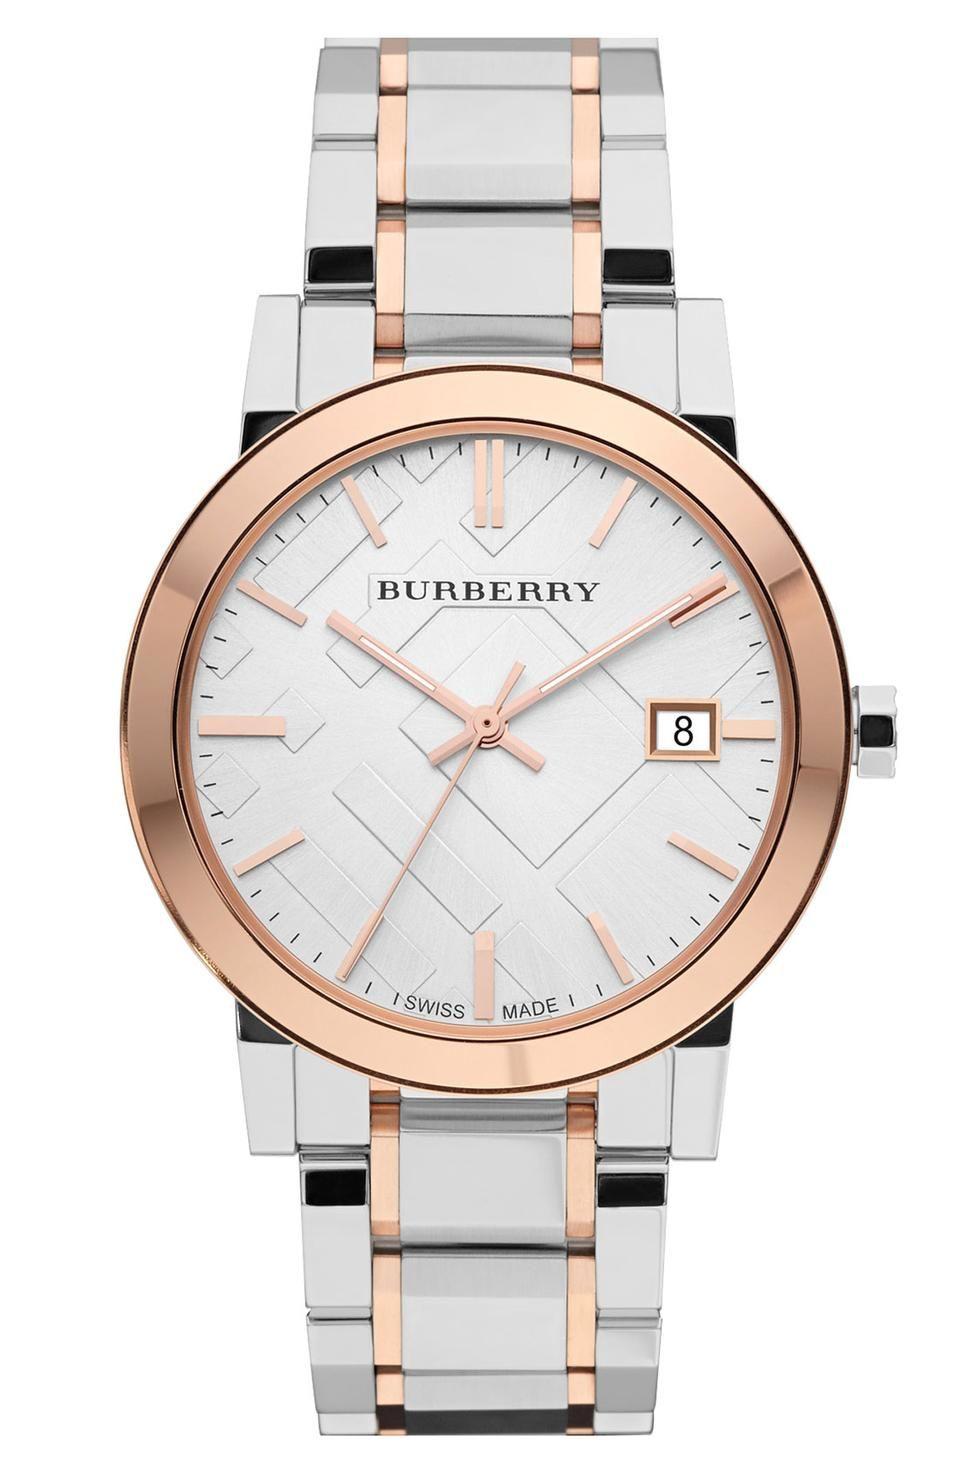 76e22fd9da4 Burberry  The City  Steel Watch   Kranich s Jewelers.